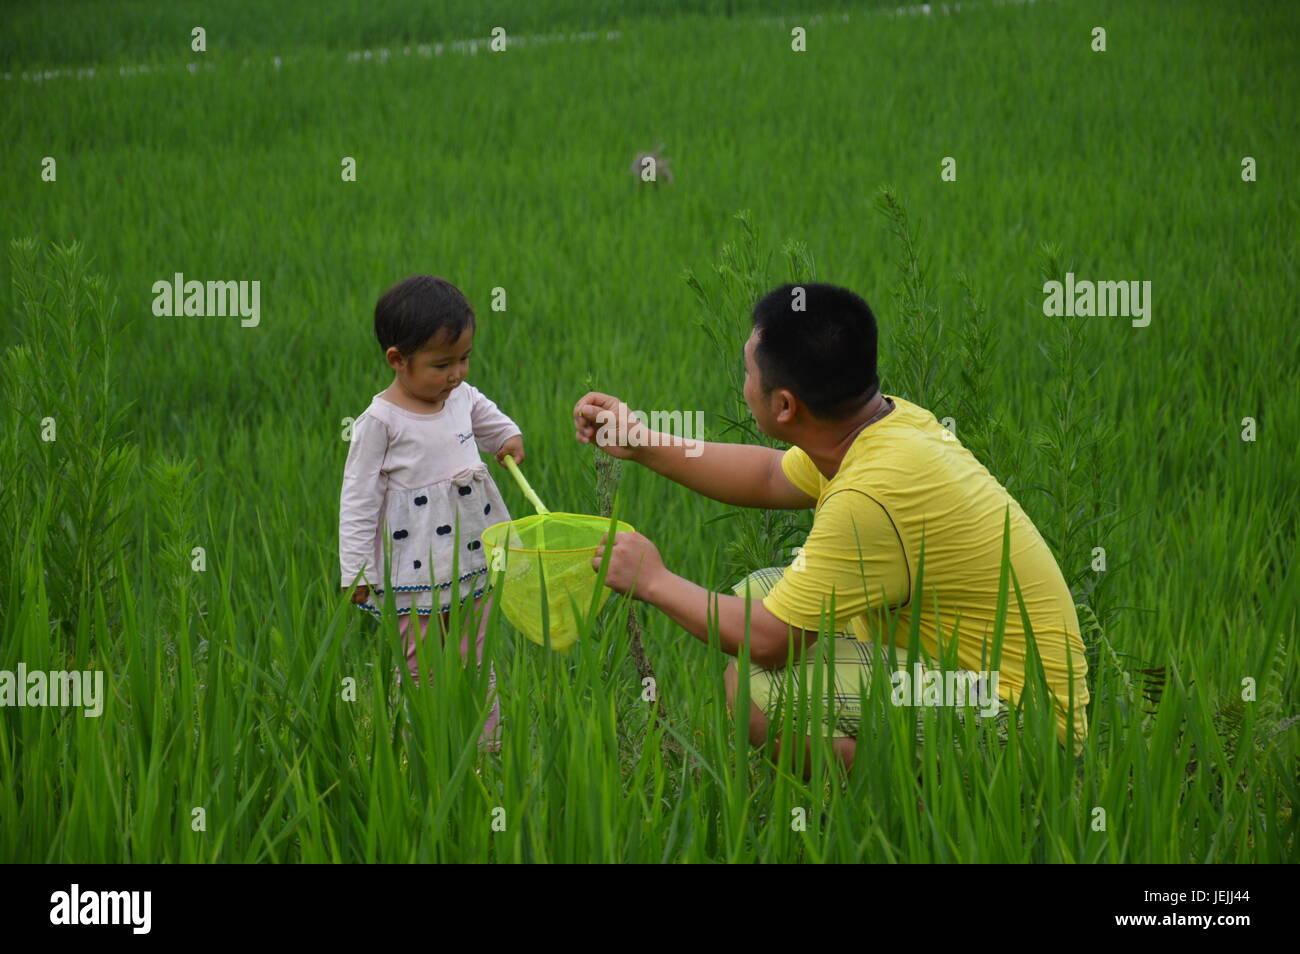 Xinlei Photos & Xinlei Images - Alamy